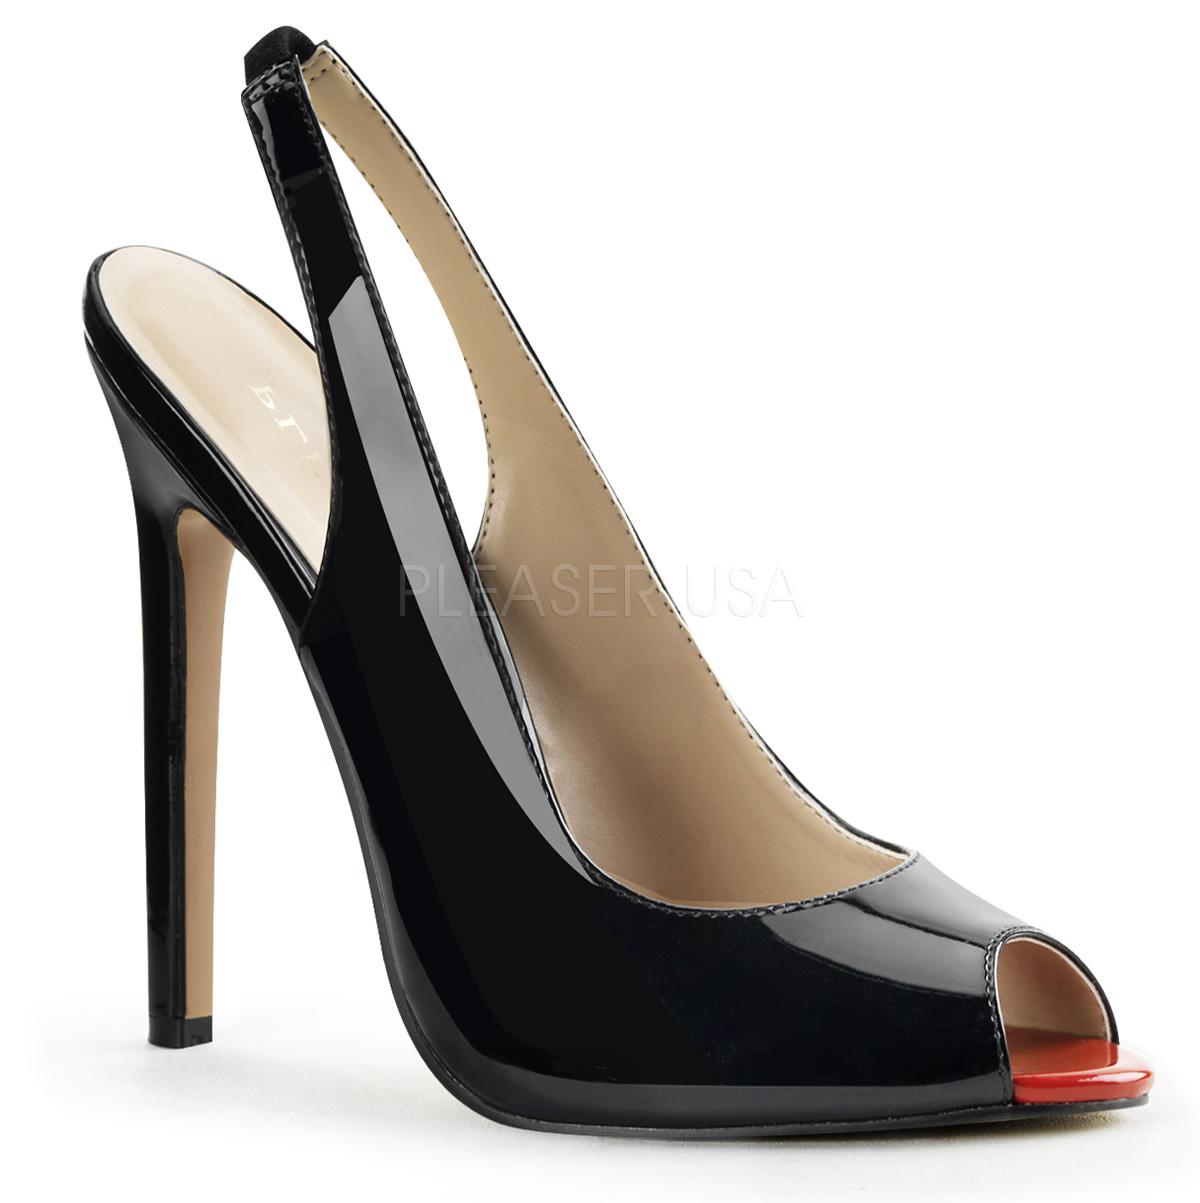 new style b9d88 9ac62 Peep Toe High Heels schwarz SEXY-08